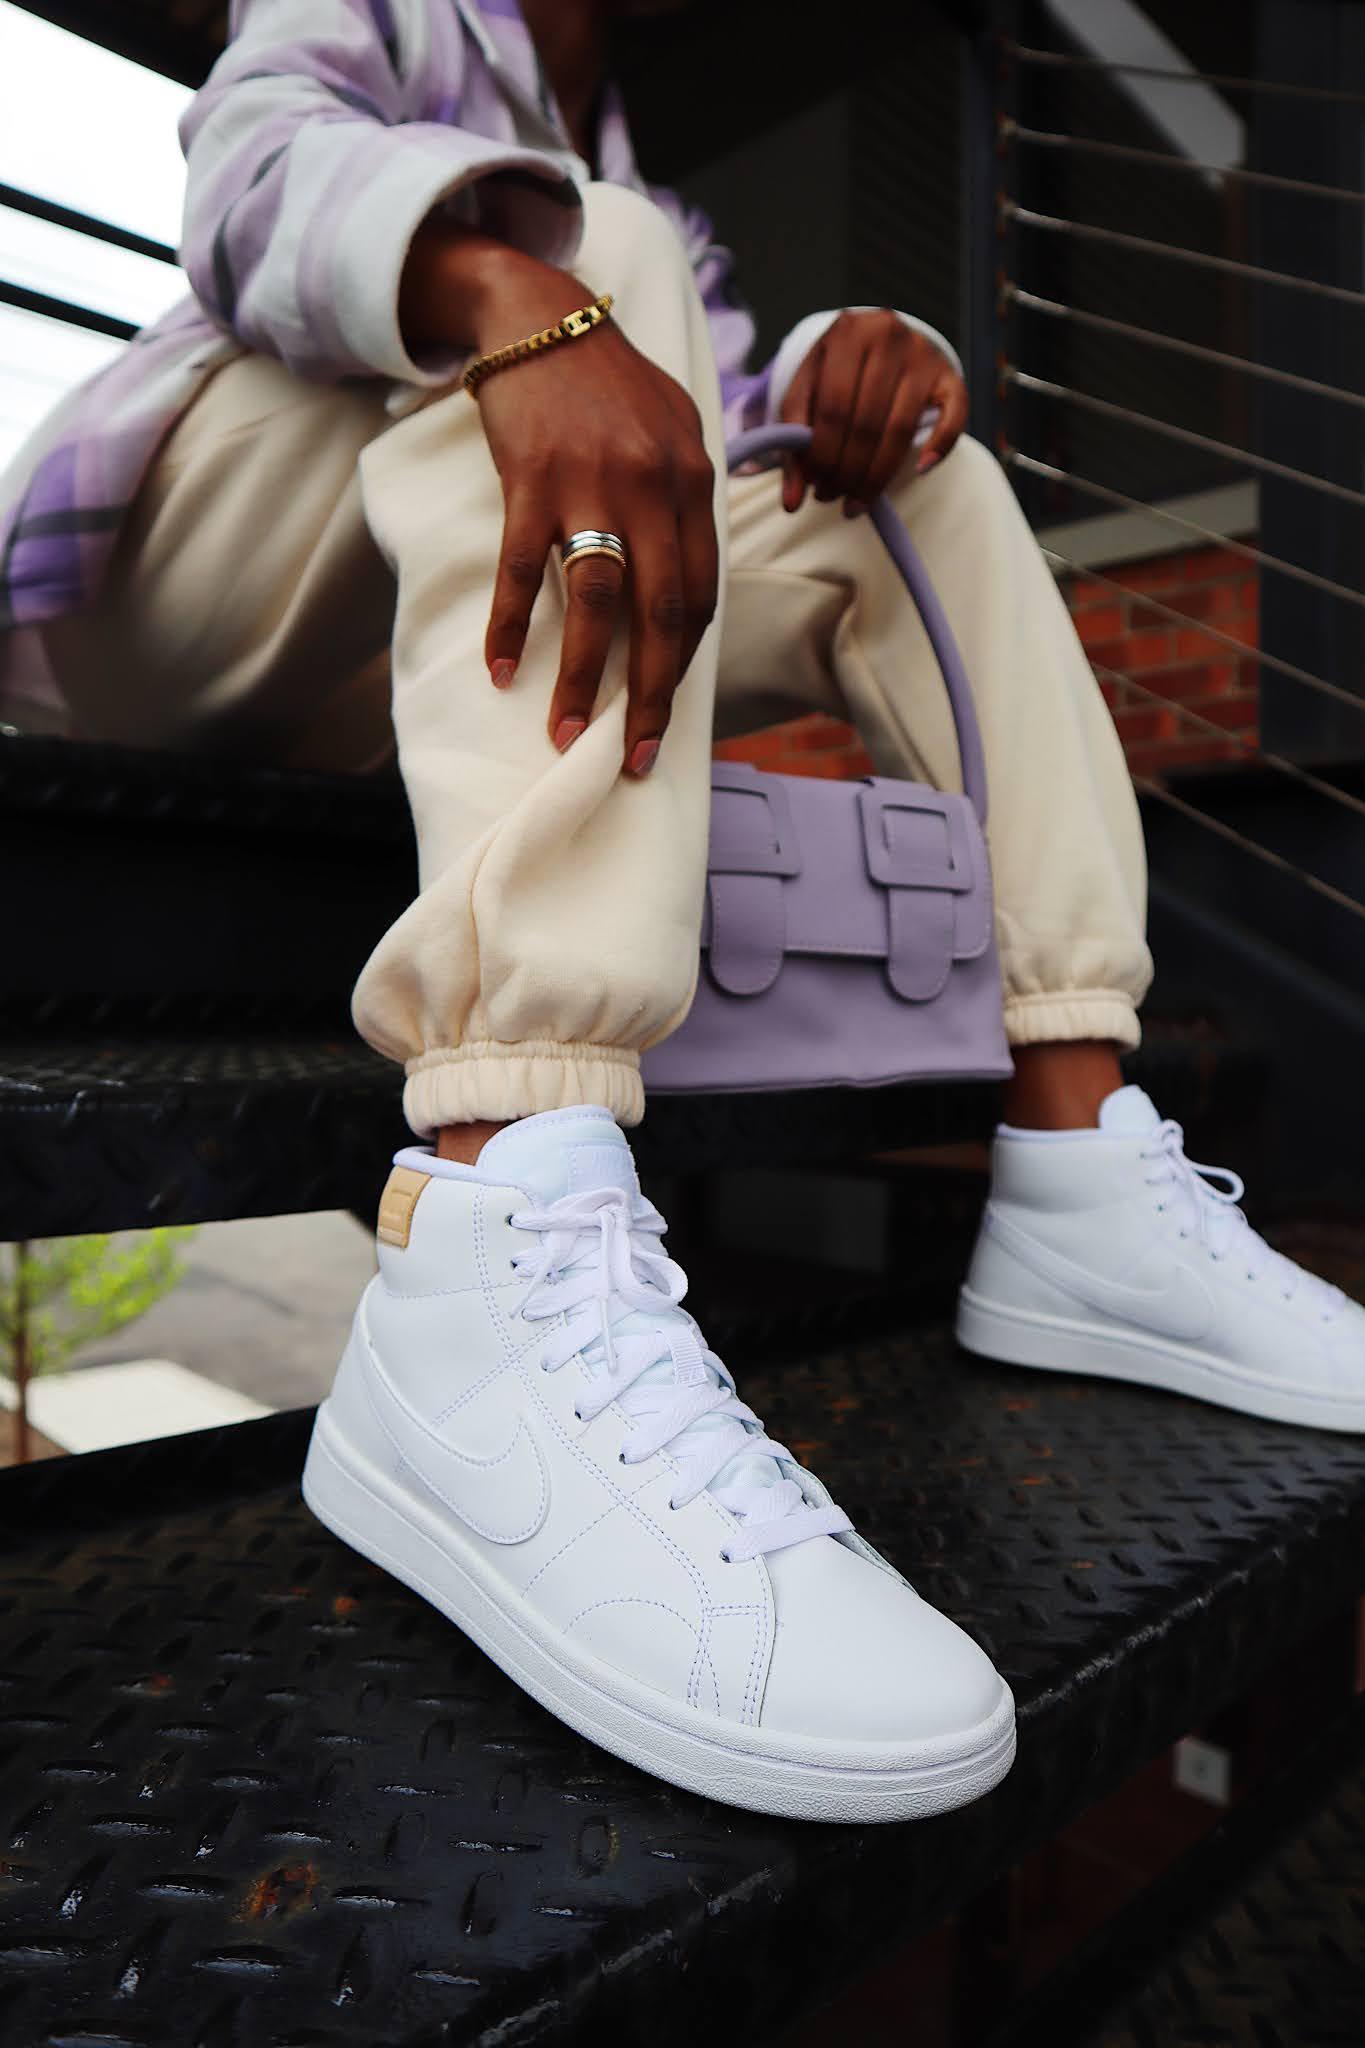 Nike women high top sneakers